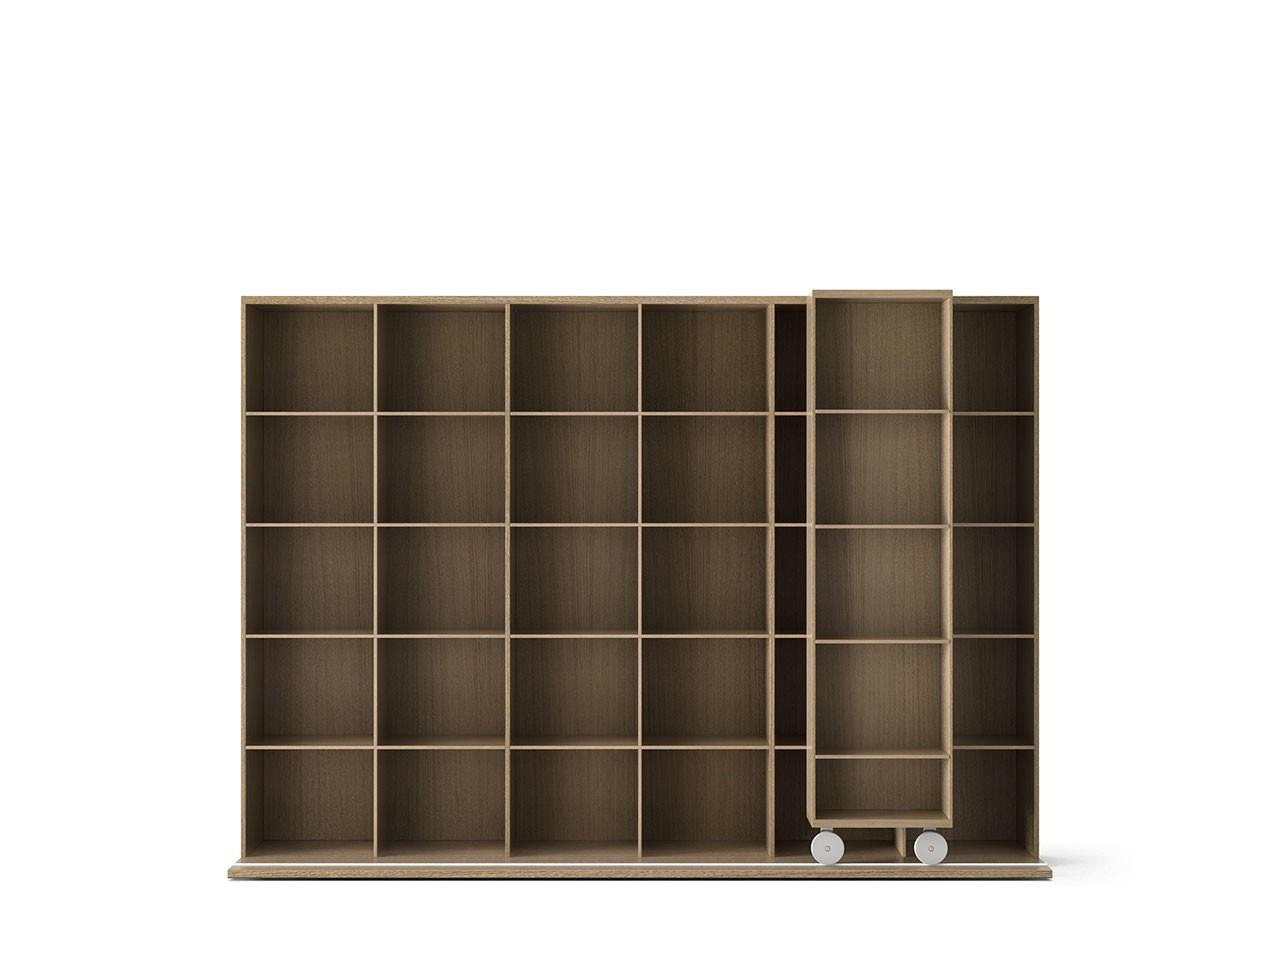 LTL430 Literatura Light Bookcase Whitened Oak, Whitened Oak